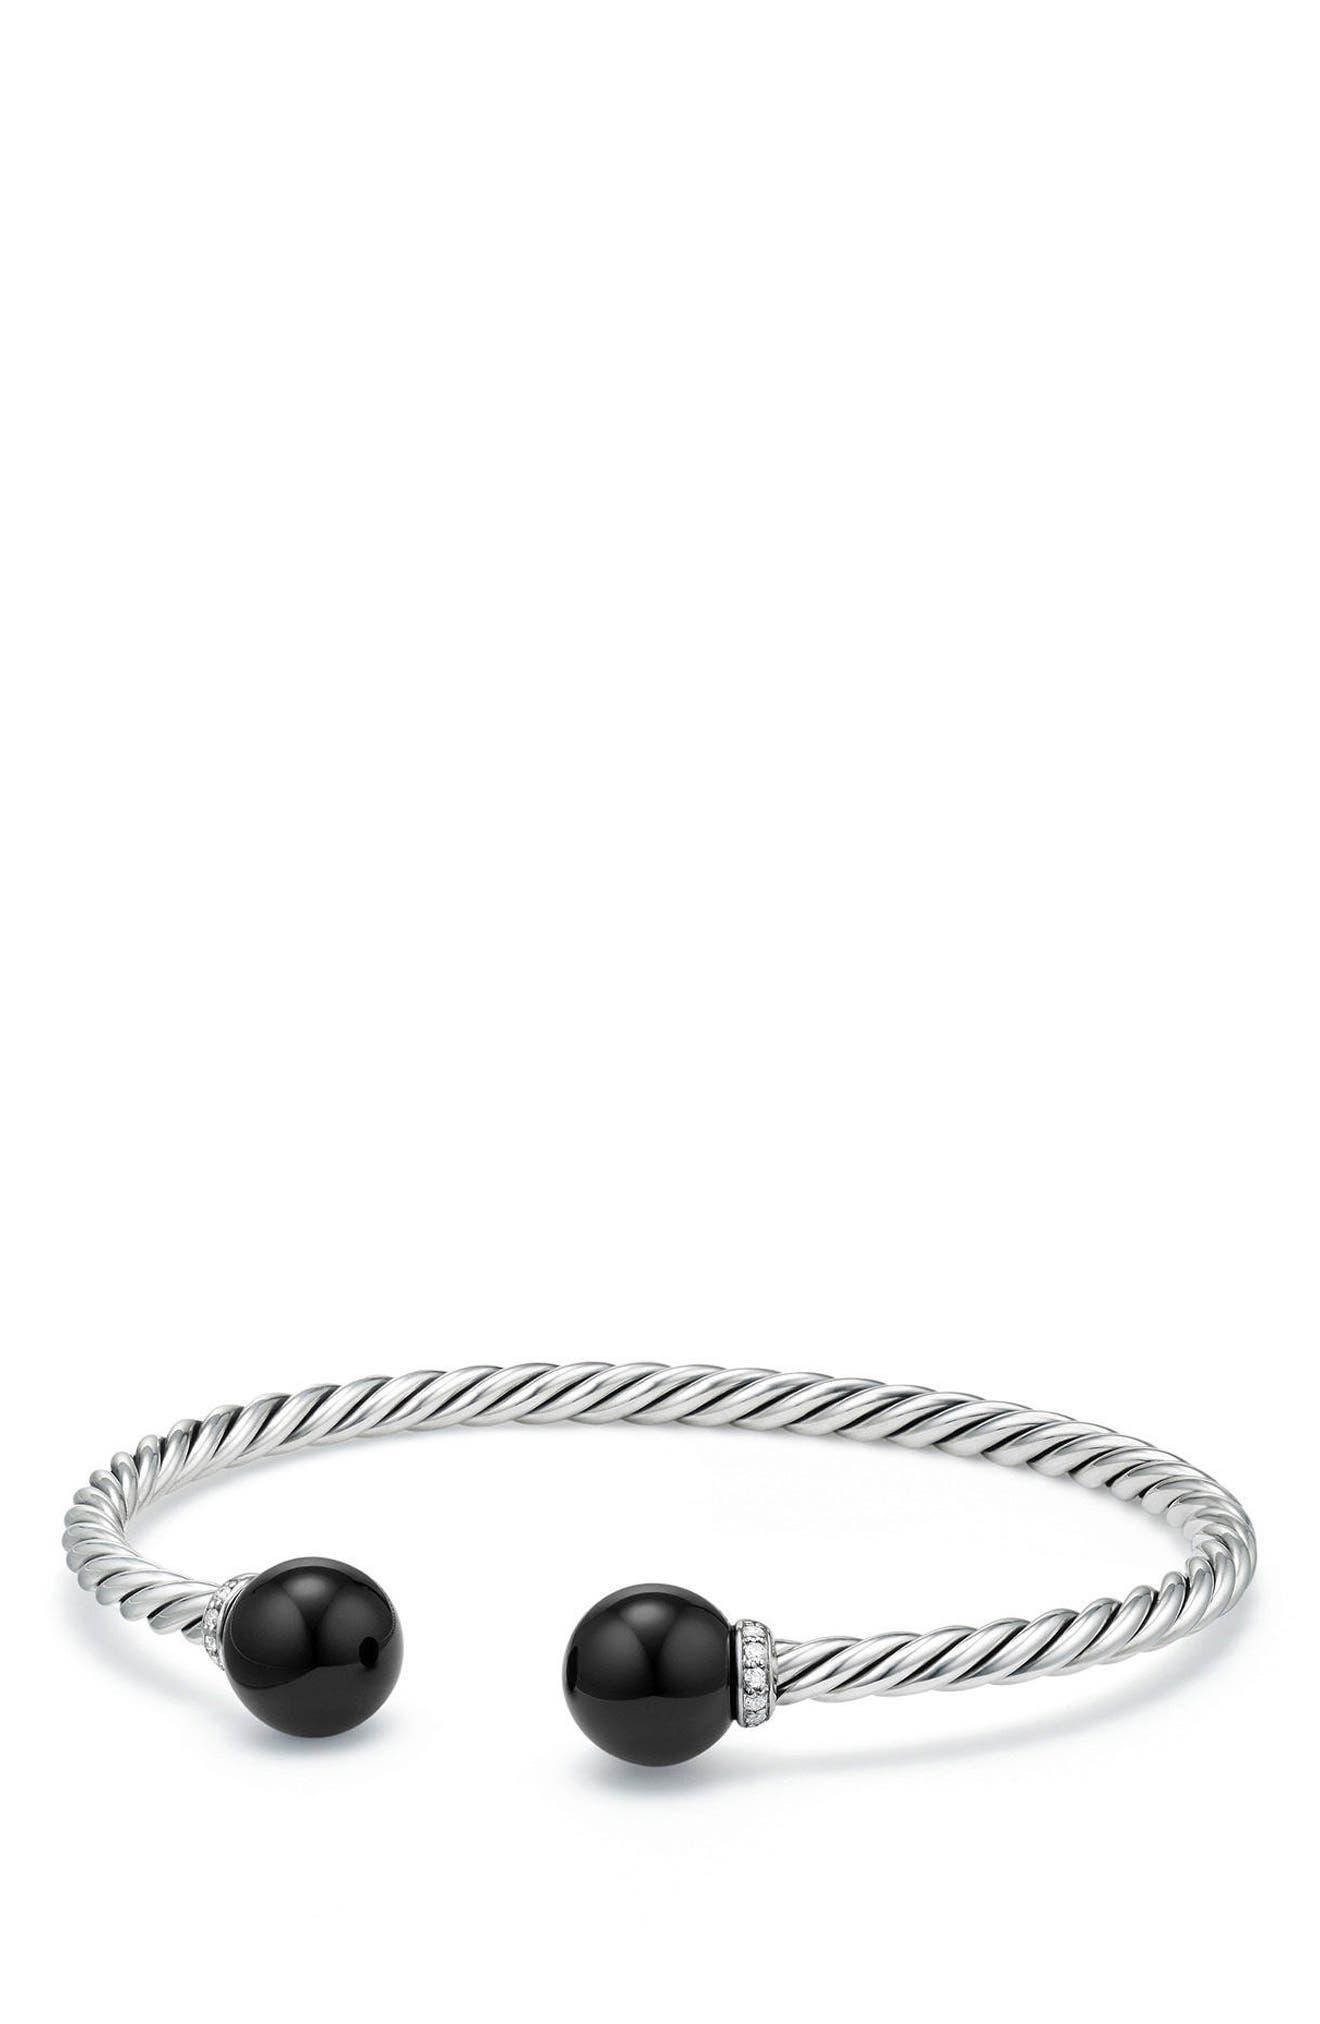 Solari Bead Bracelet with Diamonds,                         Main,                         color, SILVER/ DIAMOND/ BLACK ONYX